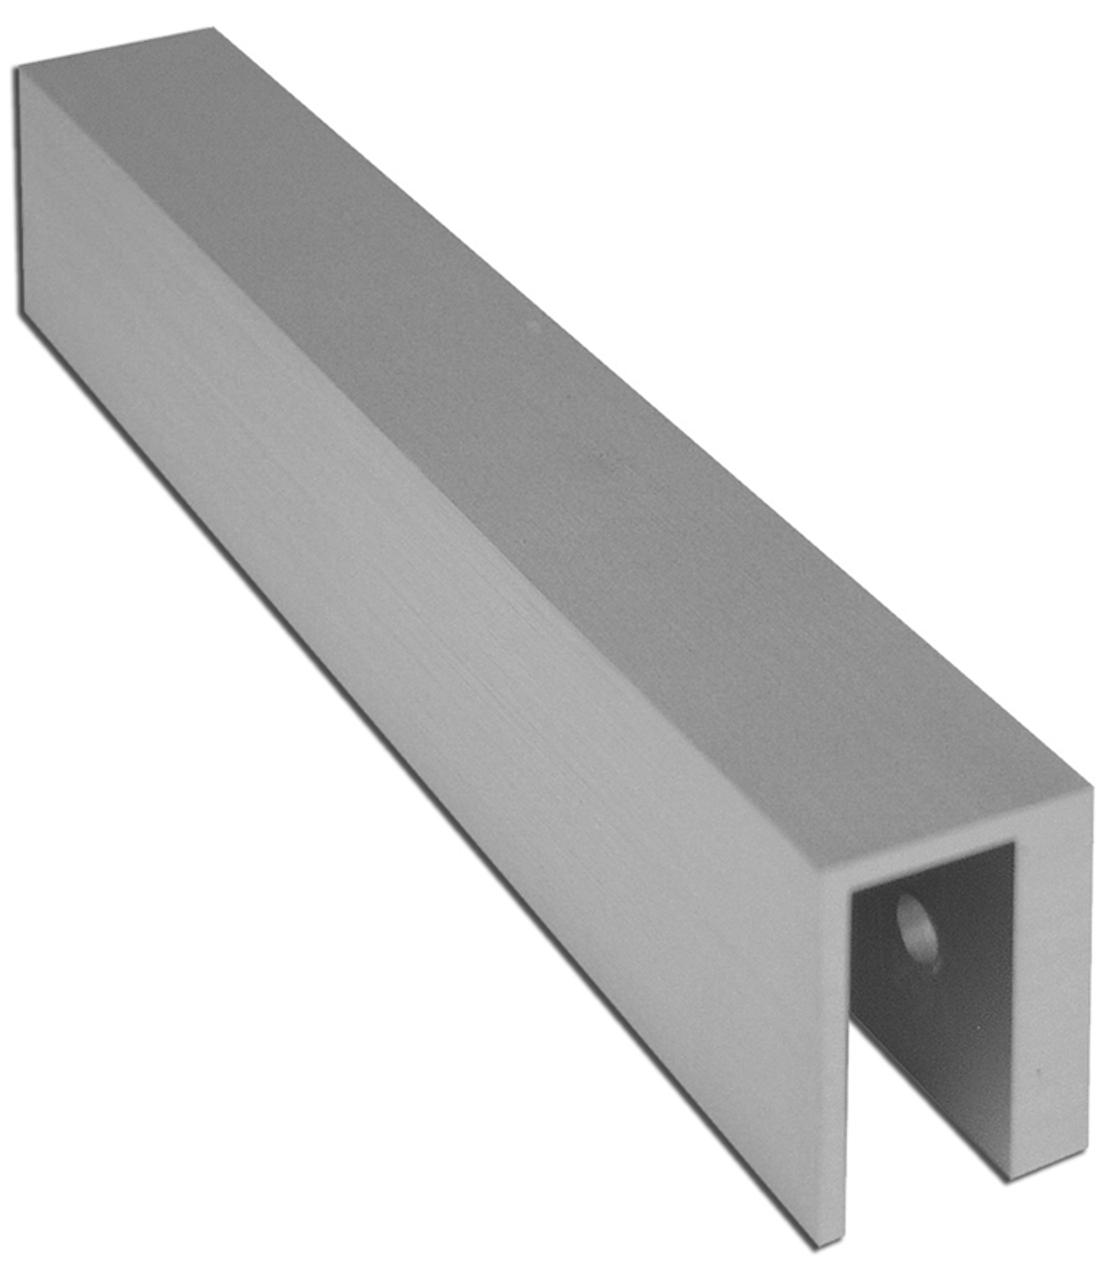 Securitron Gdb Vm600 Glass Door Brackets For Vista Vm600